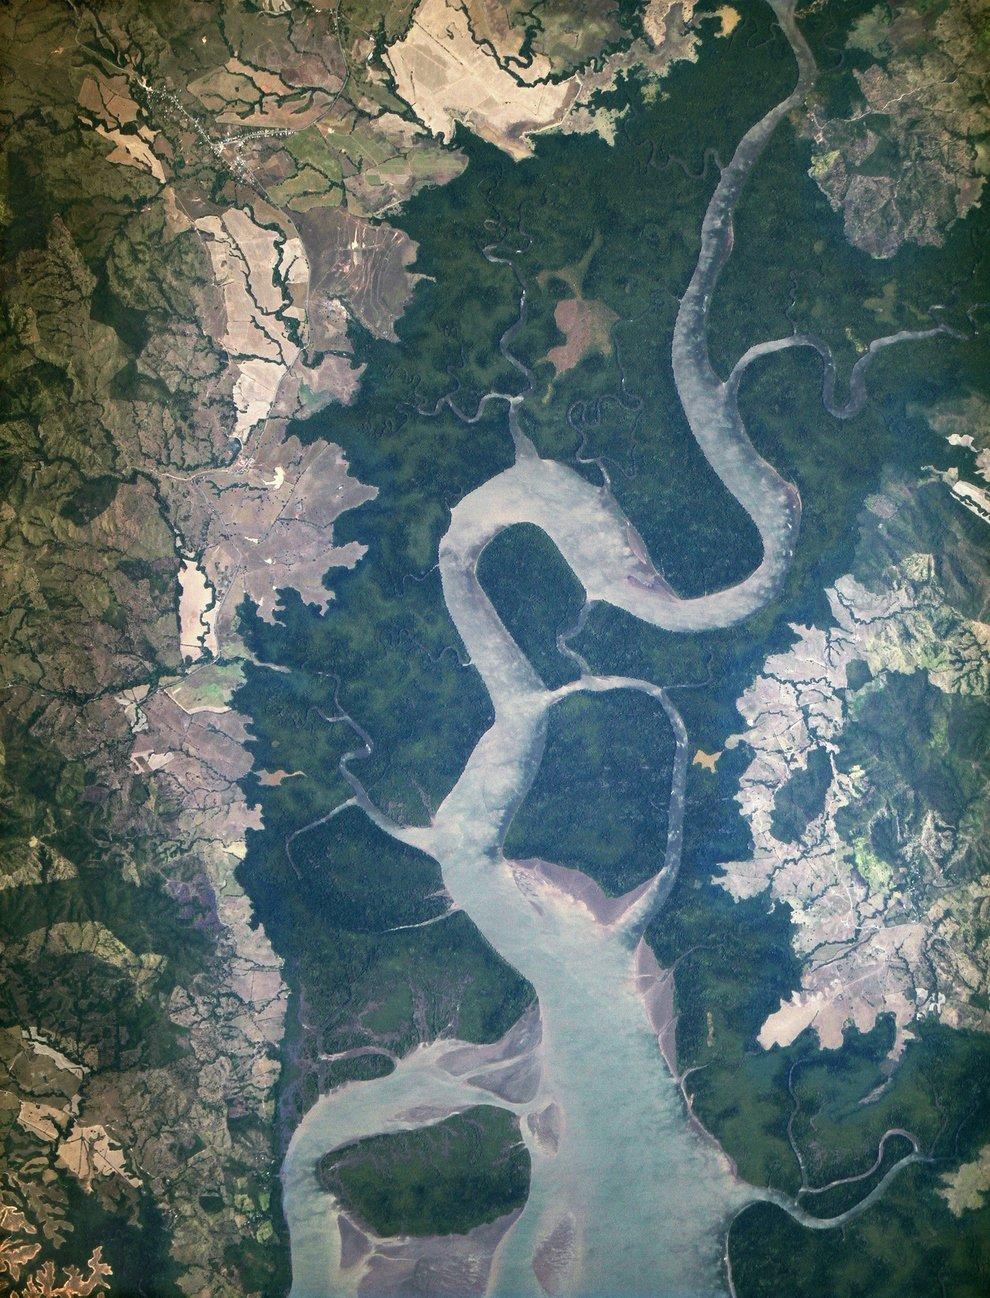 Rio San Pablo in Veraguas, Panama, as it empties into the Gulf of Montijo.